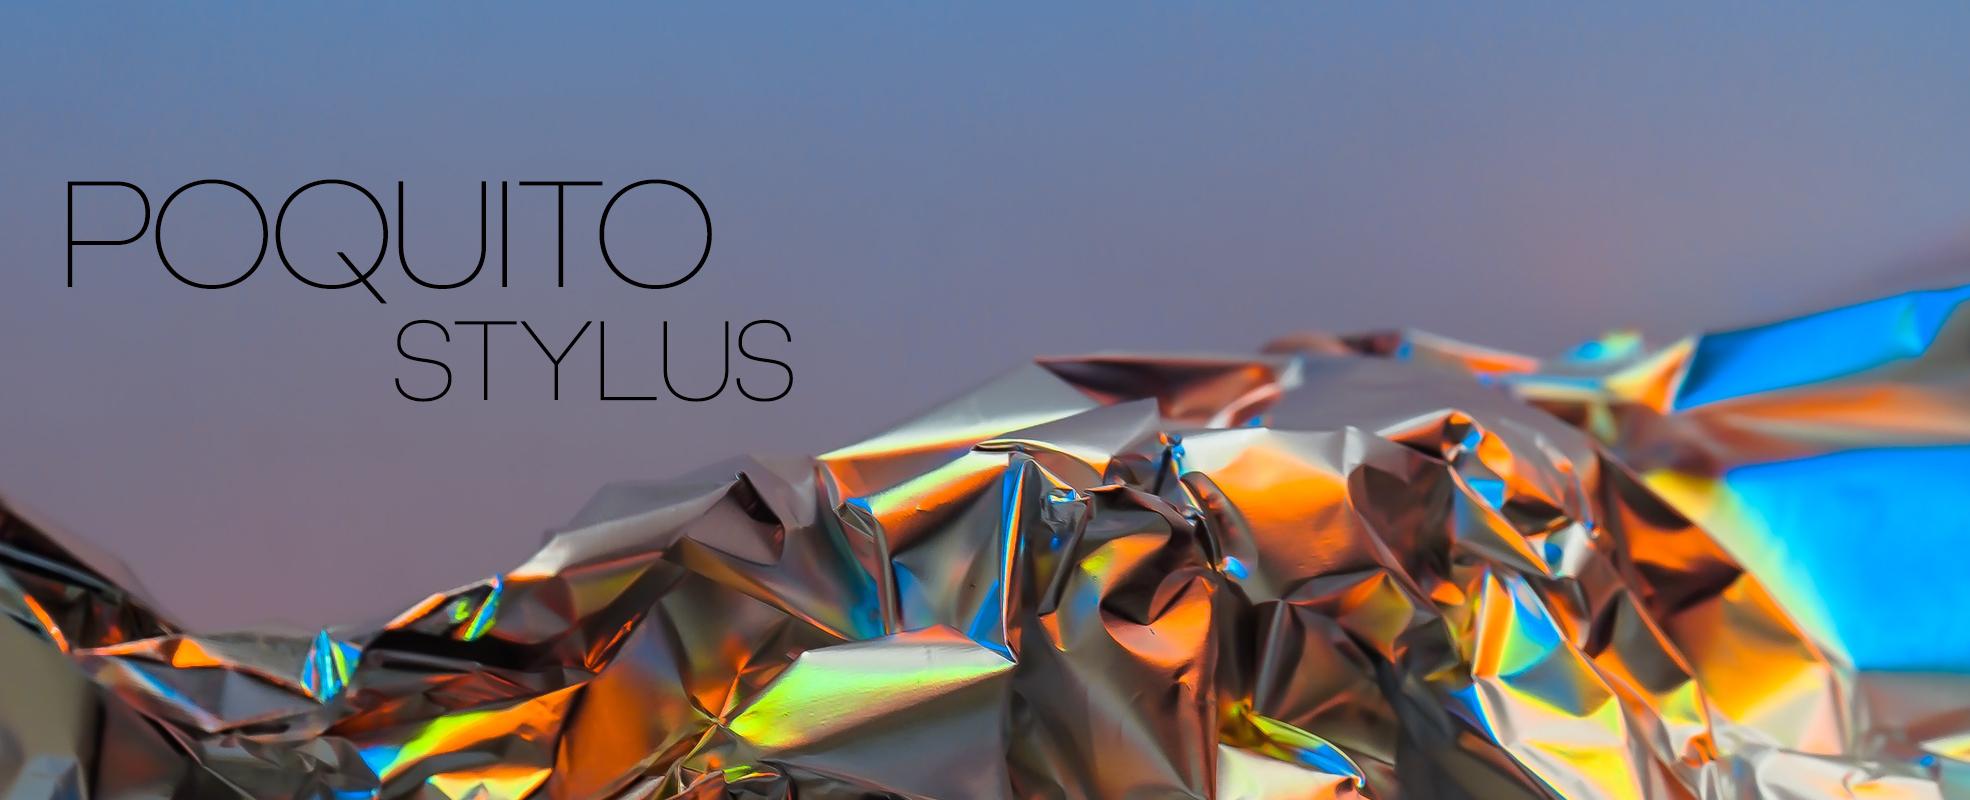 poquito-stylus-banner-1.jpg